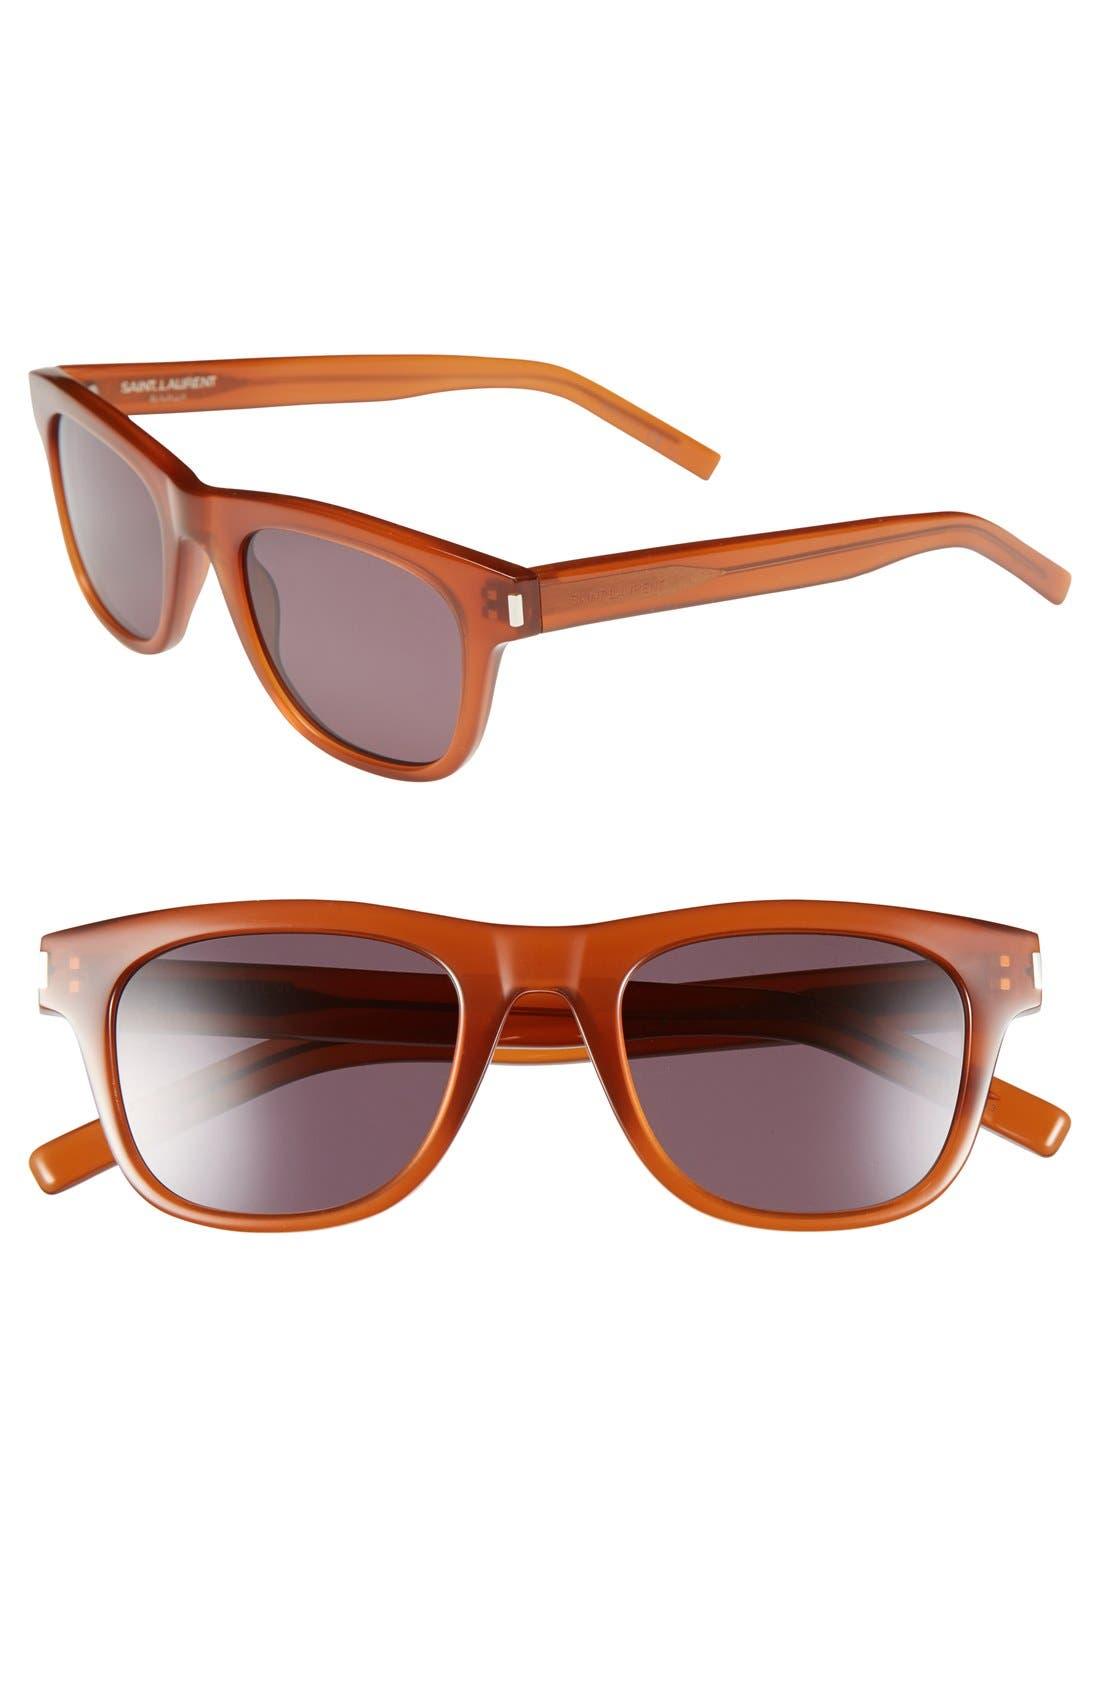 Main Image - Saint Laurent 49mm Sunglasses